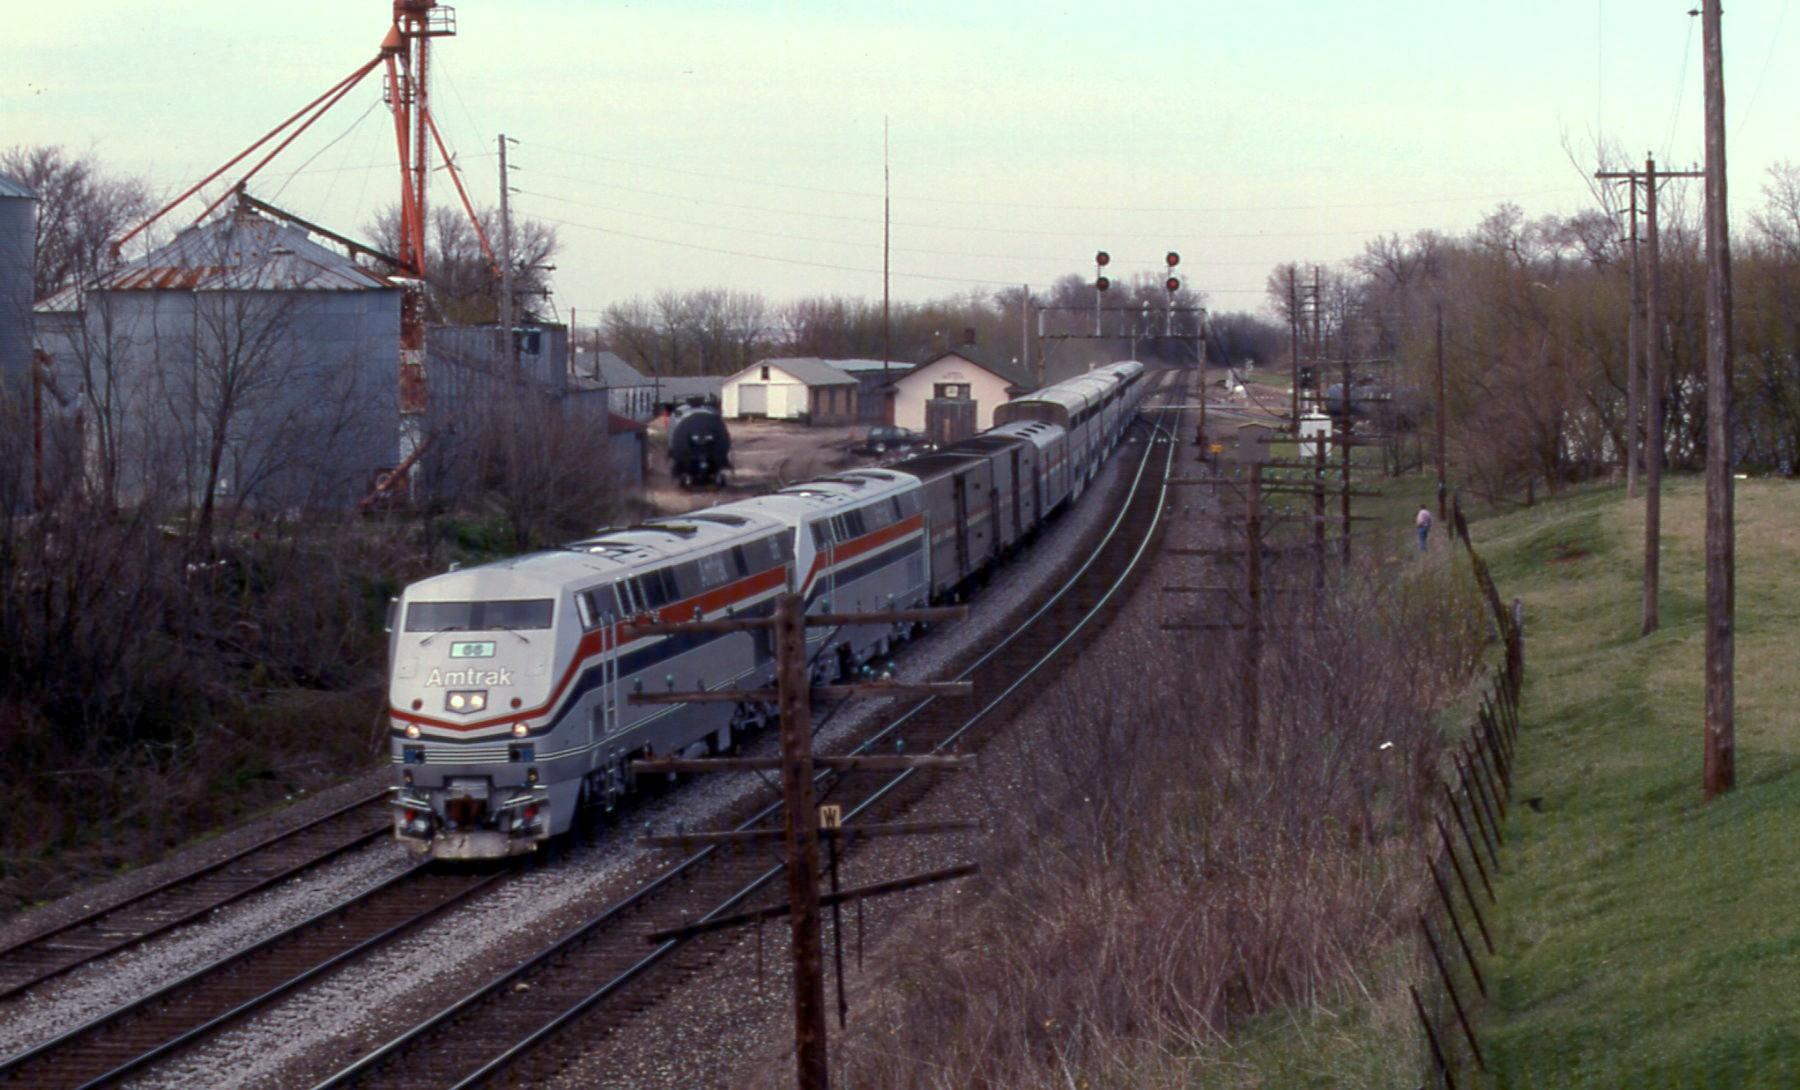 Eastern Long Distance Train — Amtrak: History of America's Railroad